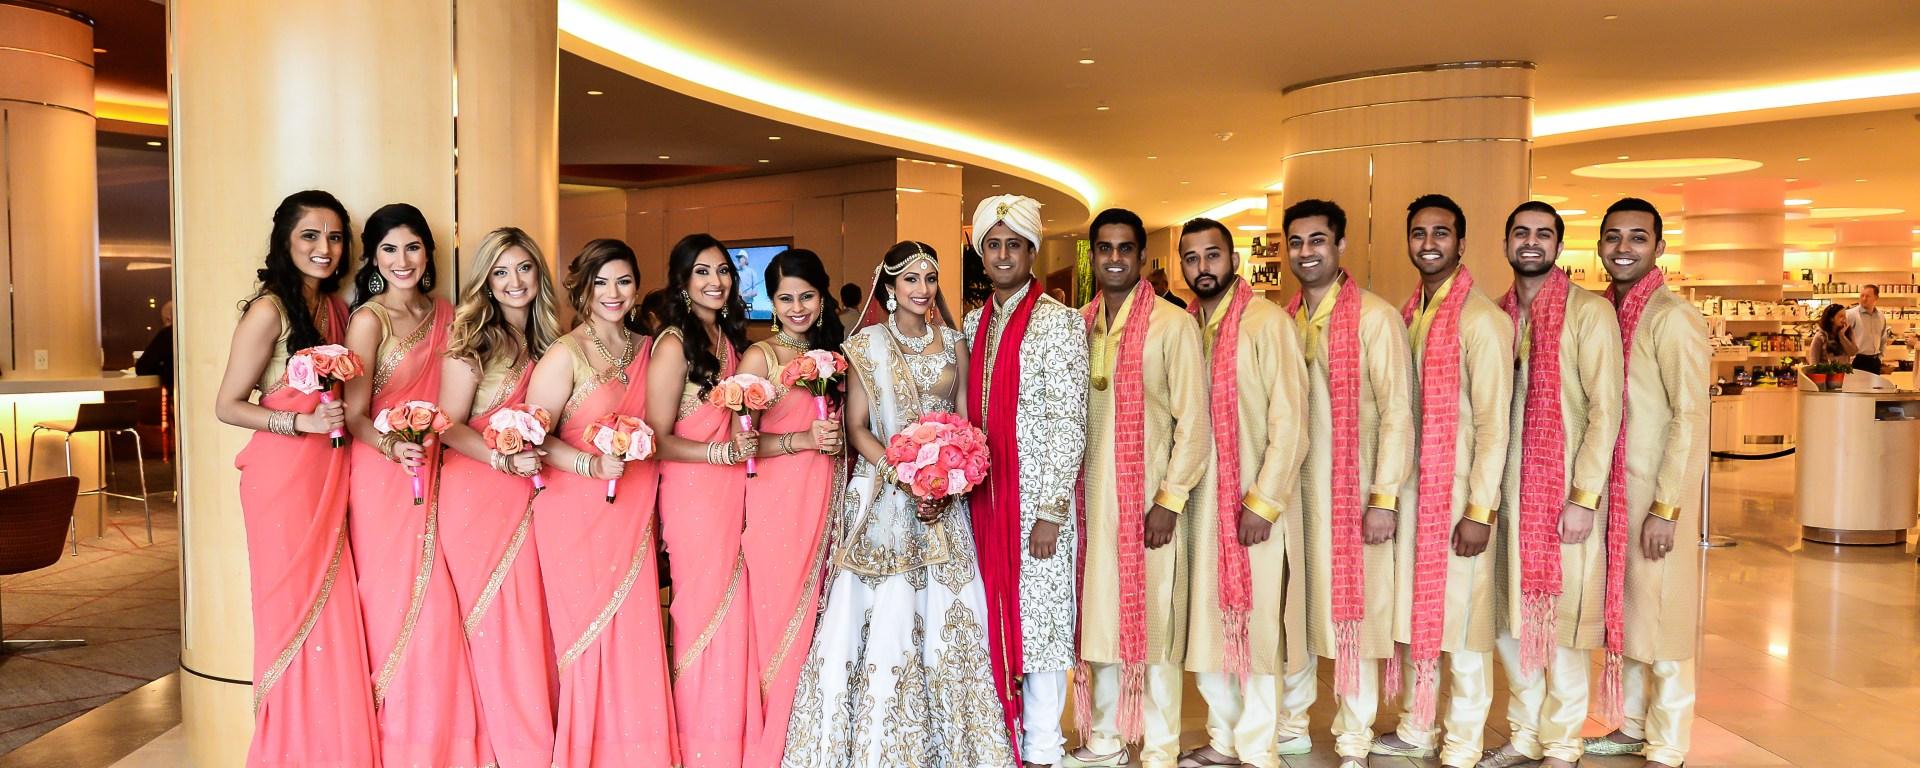 Bridal party photo at an Indian wedding